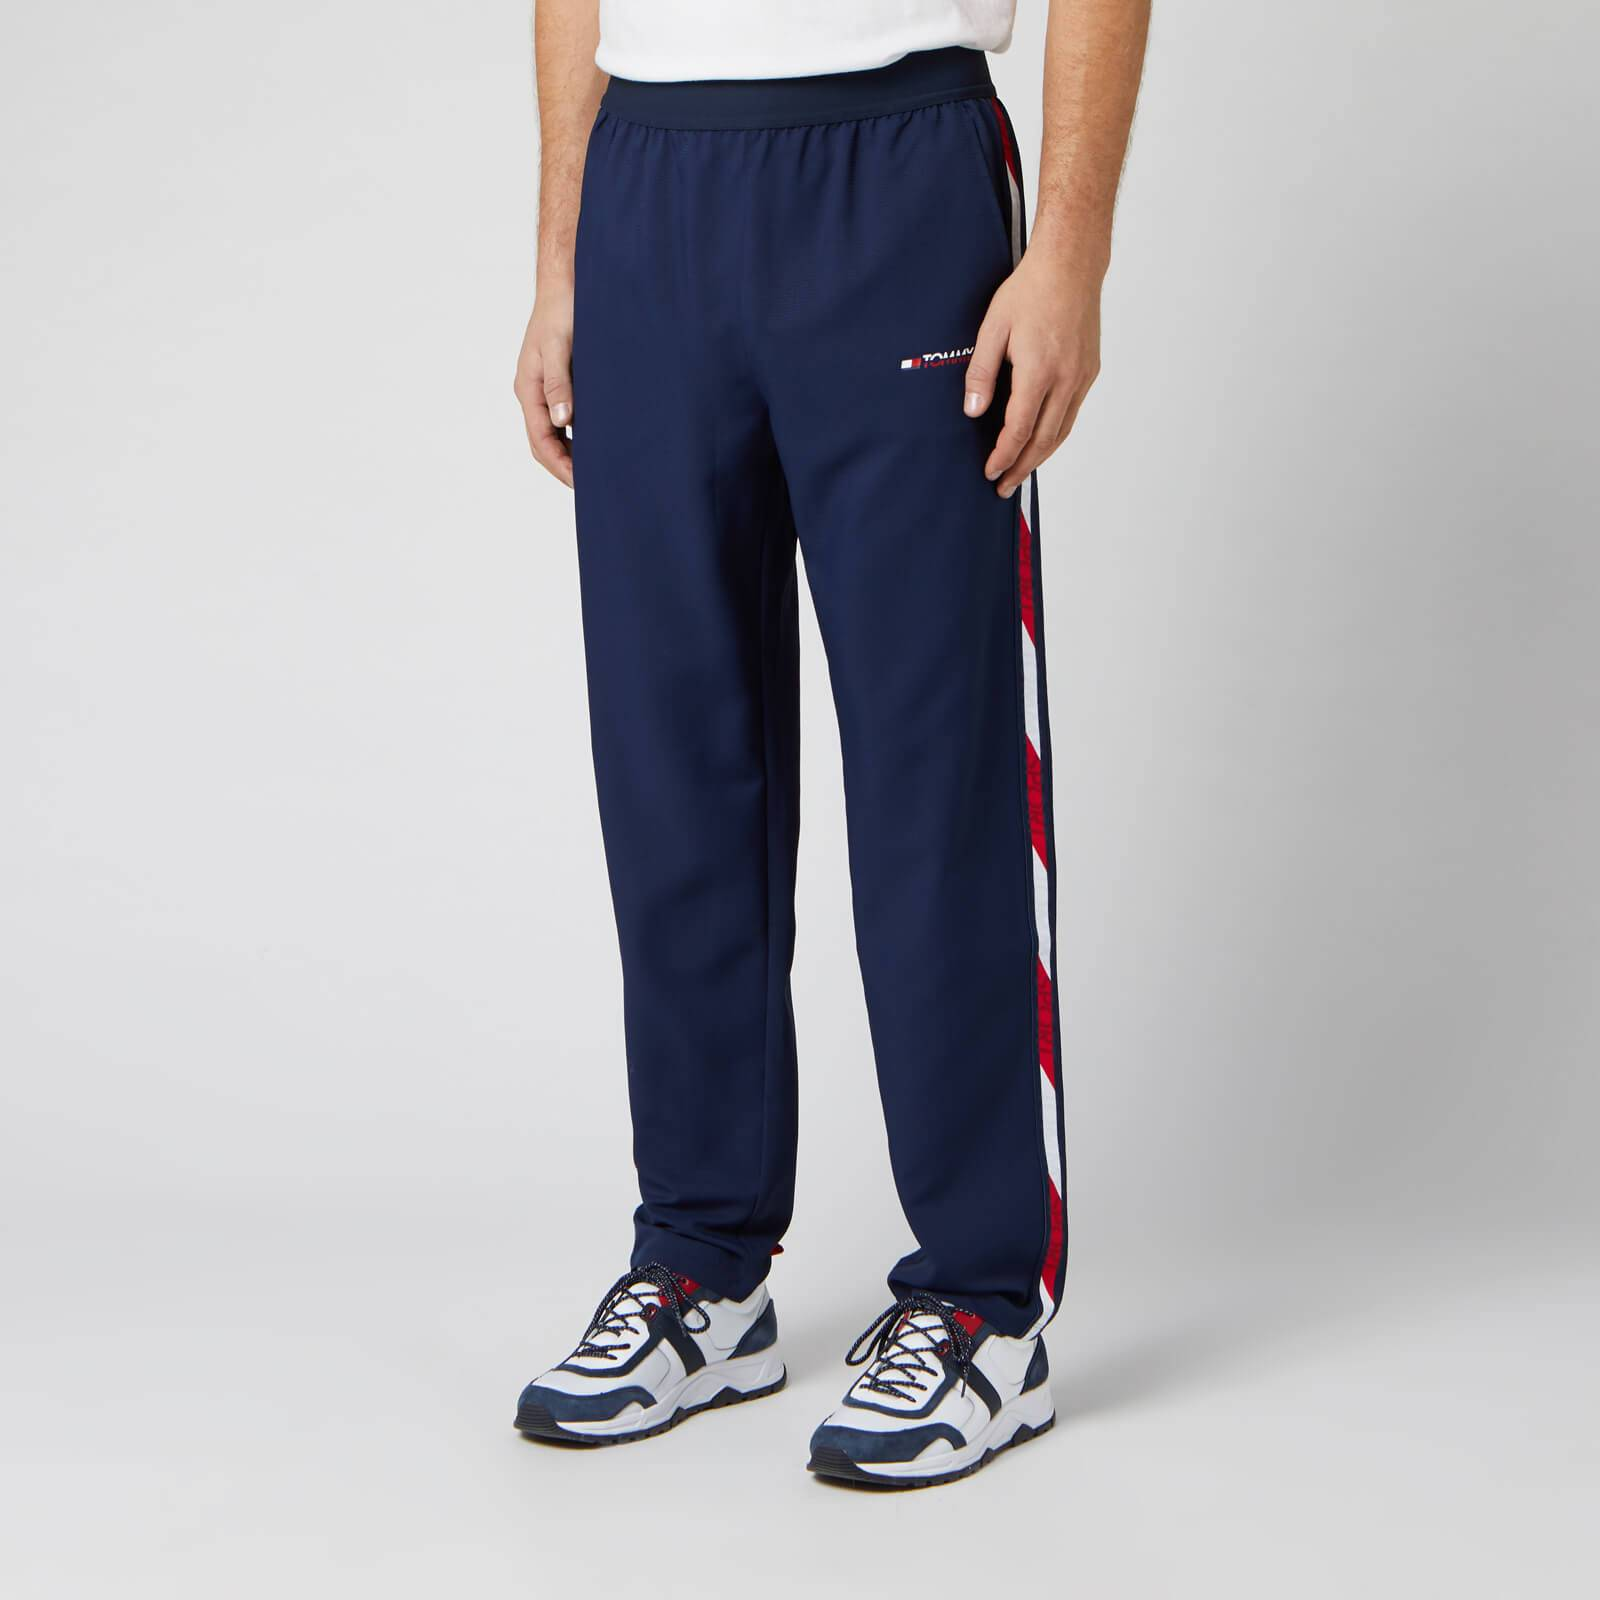 Tommy Hilfiger Sport Men's Woven Tape Pants - Sport Navy - S